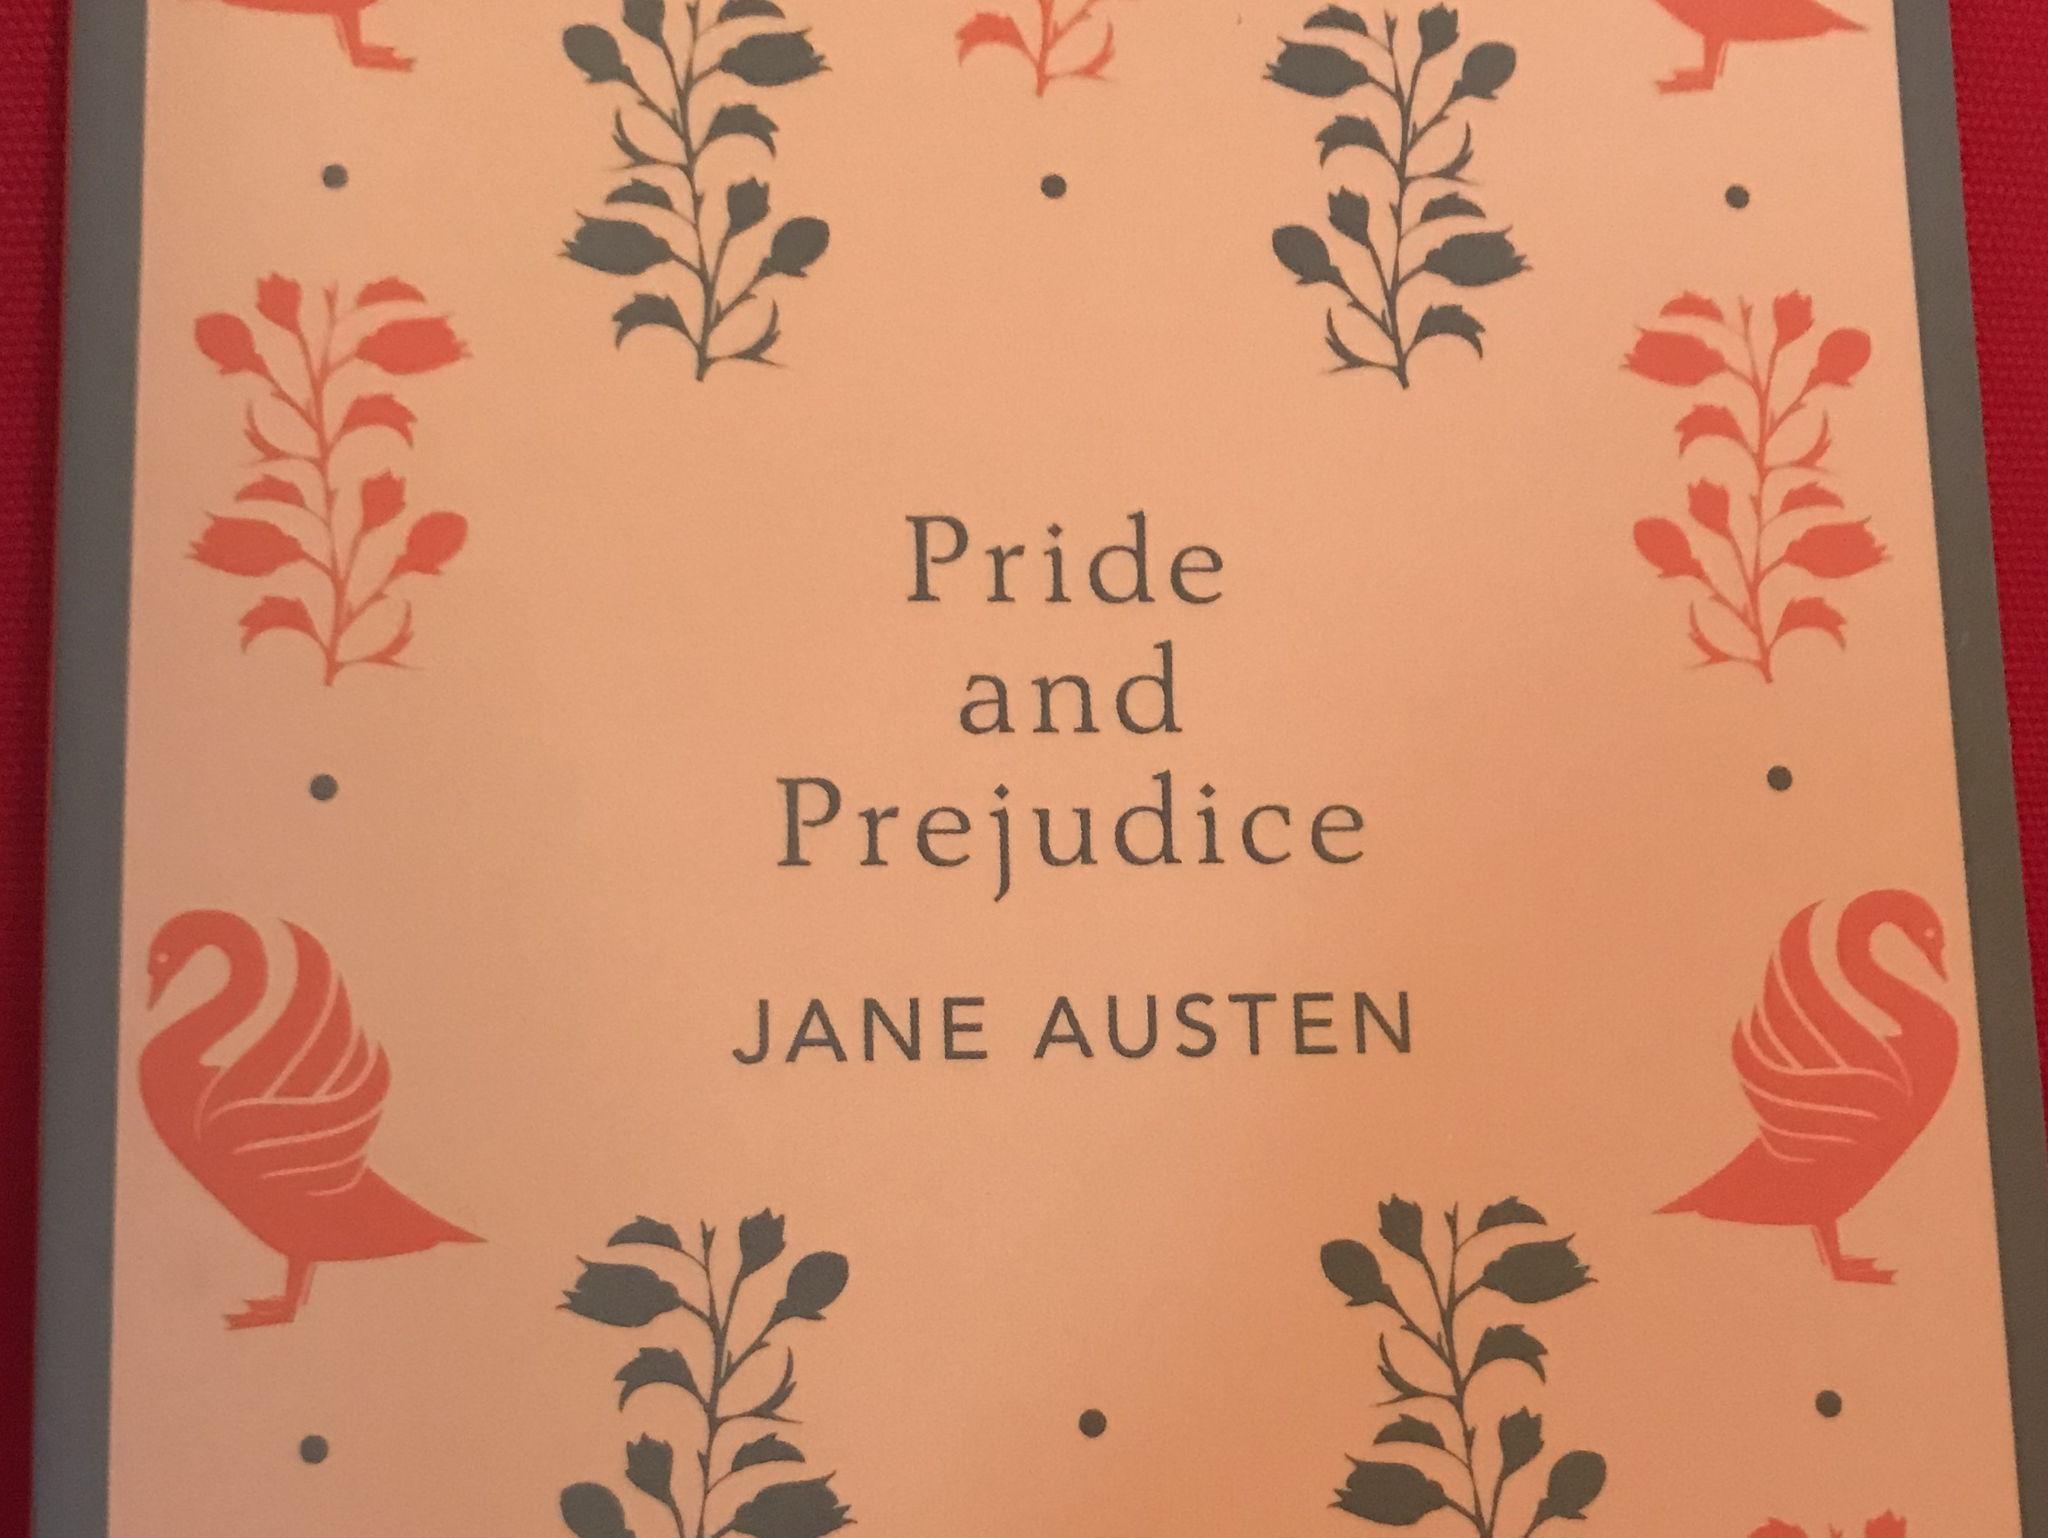 Pride and Prejudice - Comprehension and Analysis